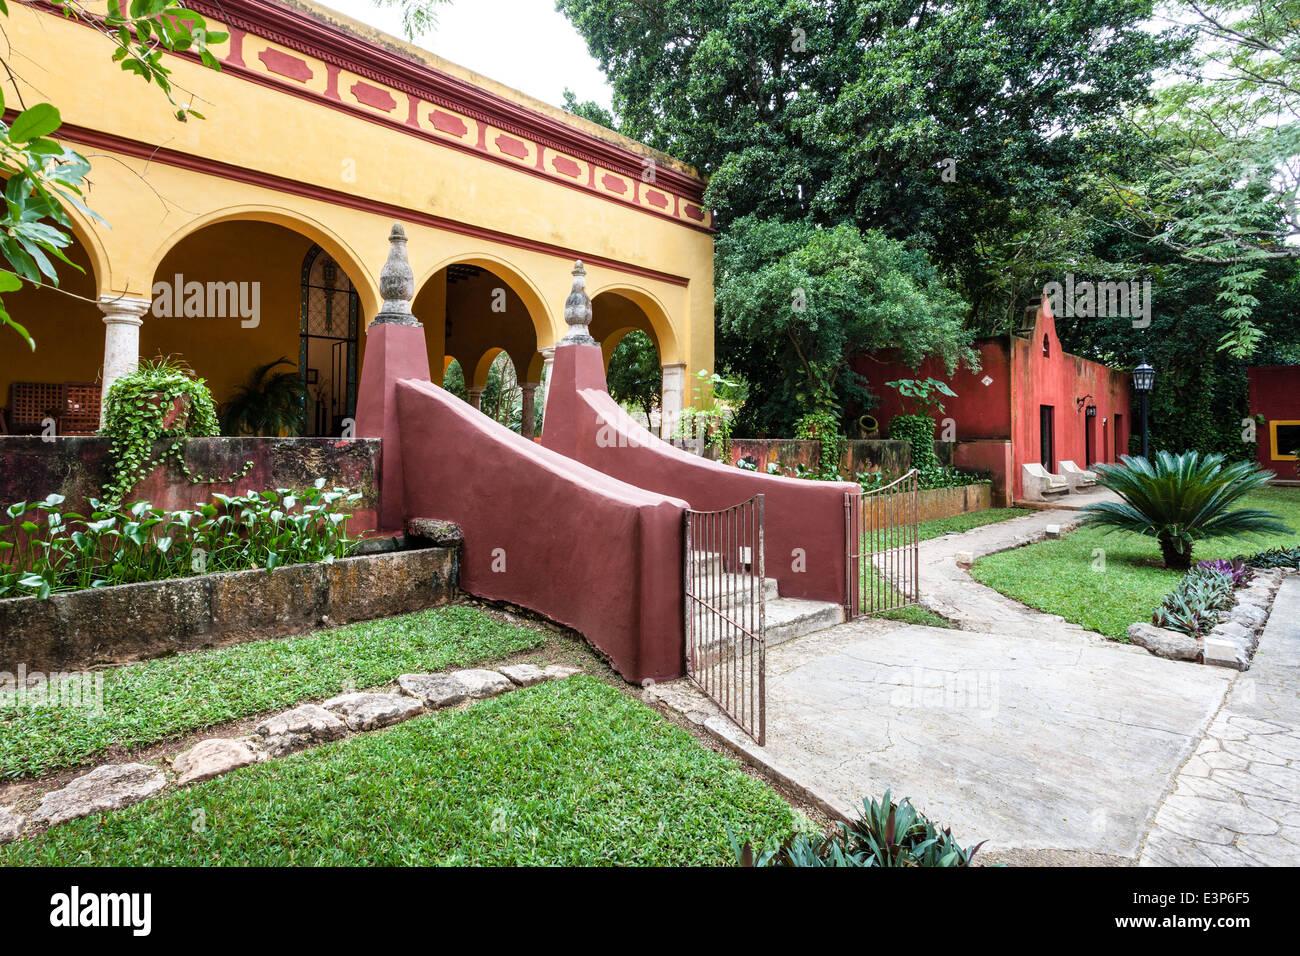 Eingang zur Hacienda misne in Merida, Yucatan, Mexiko. Stockbild